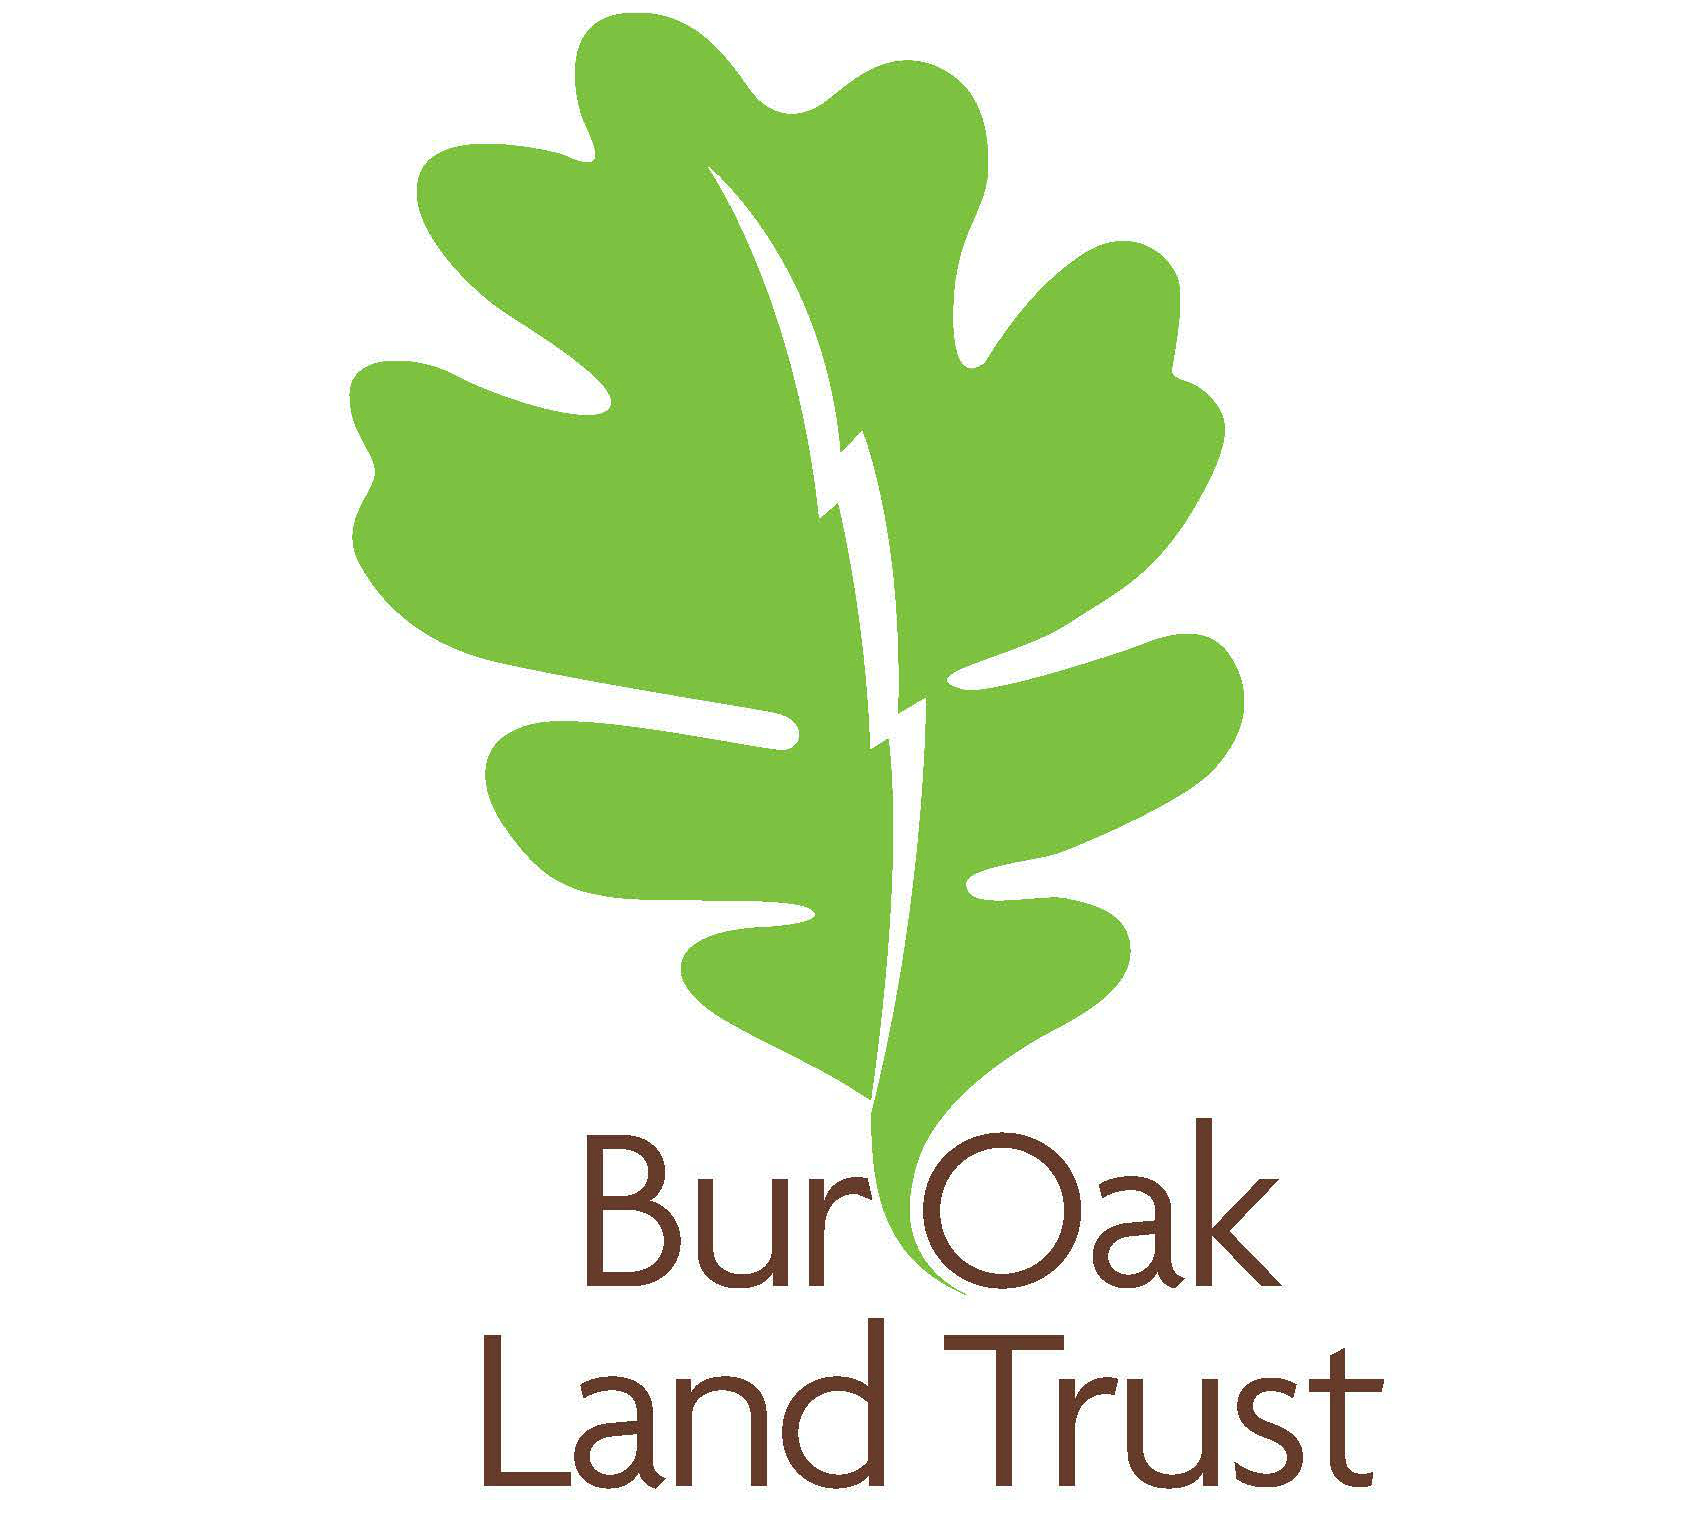 Bur Oak Land Trust